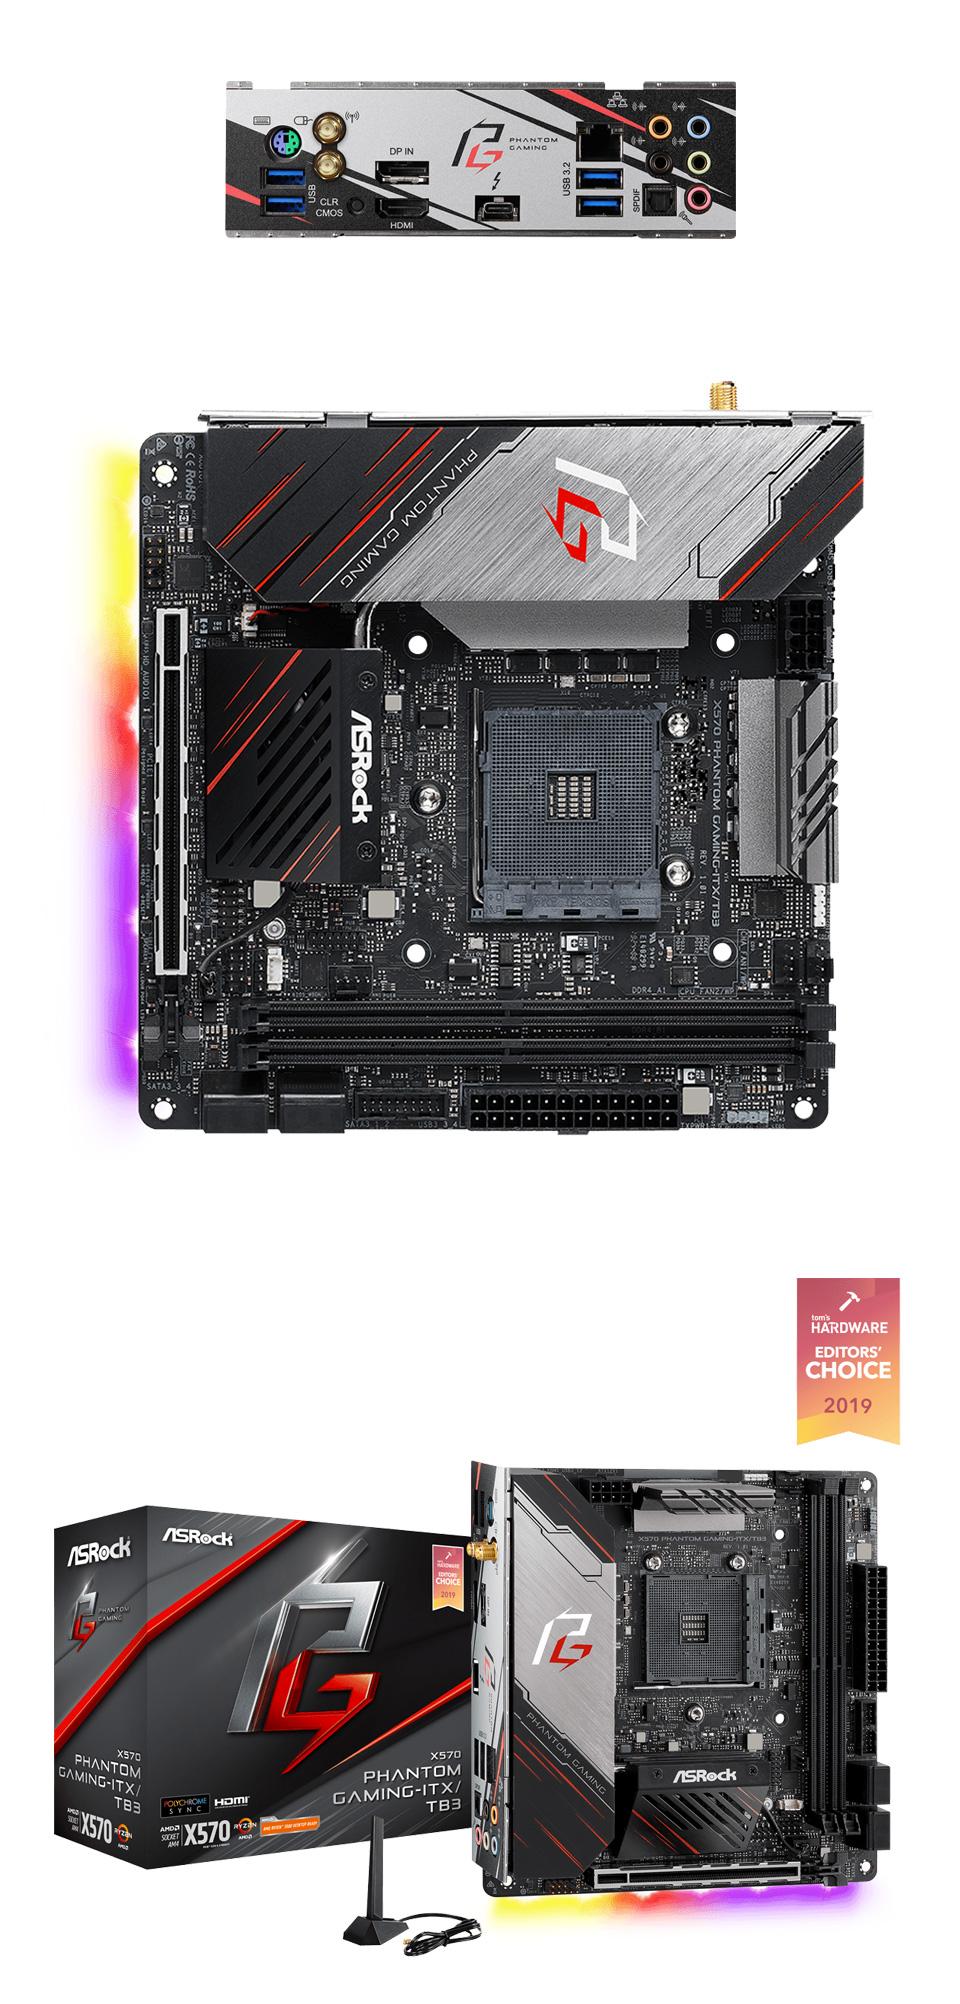 ASRock X570 Phantom Gaming ITX/TB3 Motherboard product